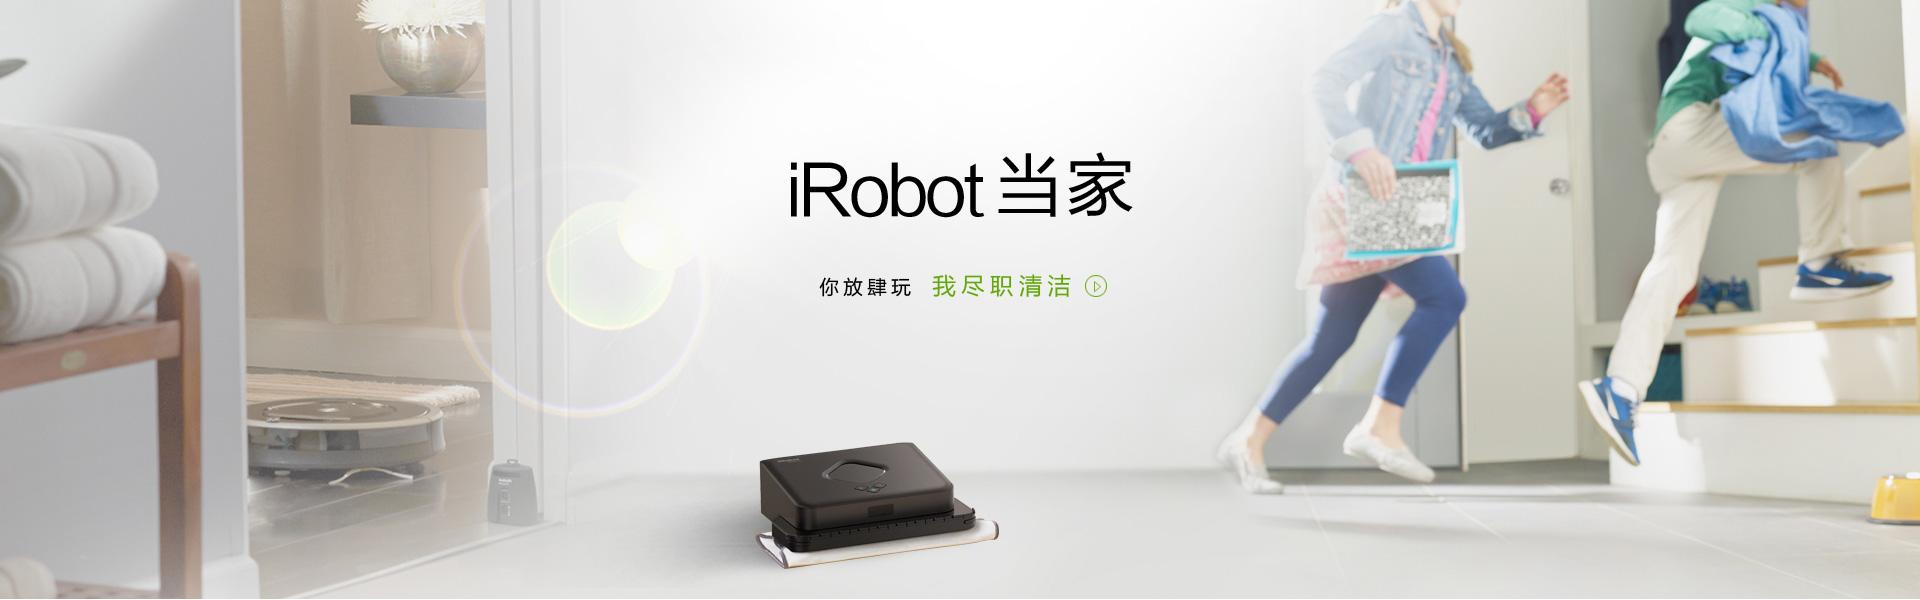 iRobot HOME 应用程序